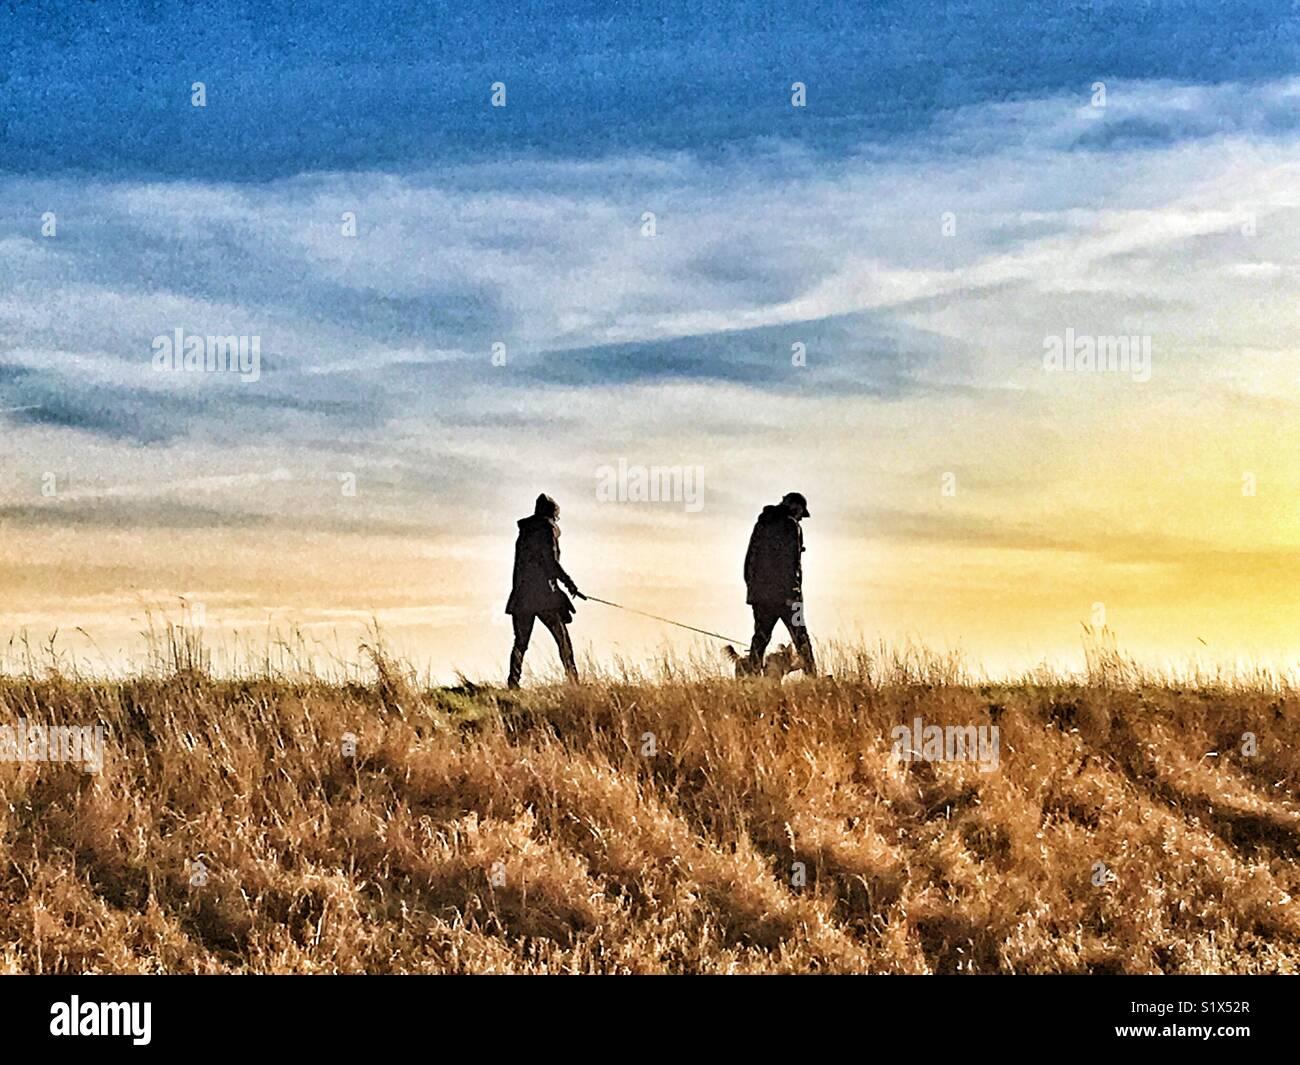 Promener le chien dans la campagne britannique Photo Stock